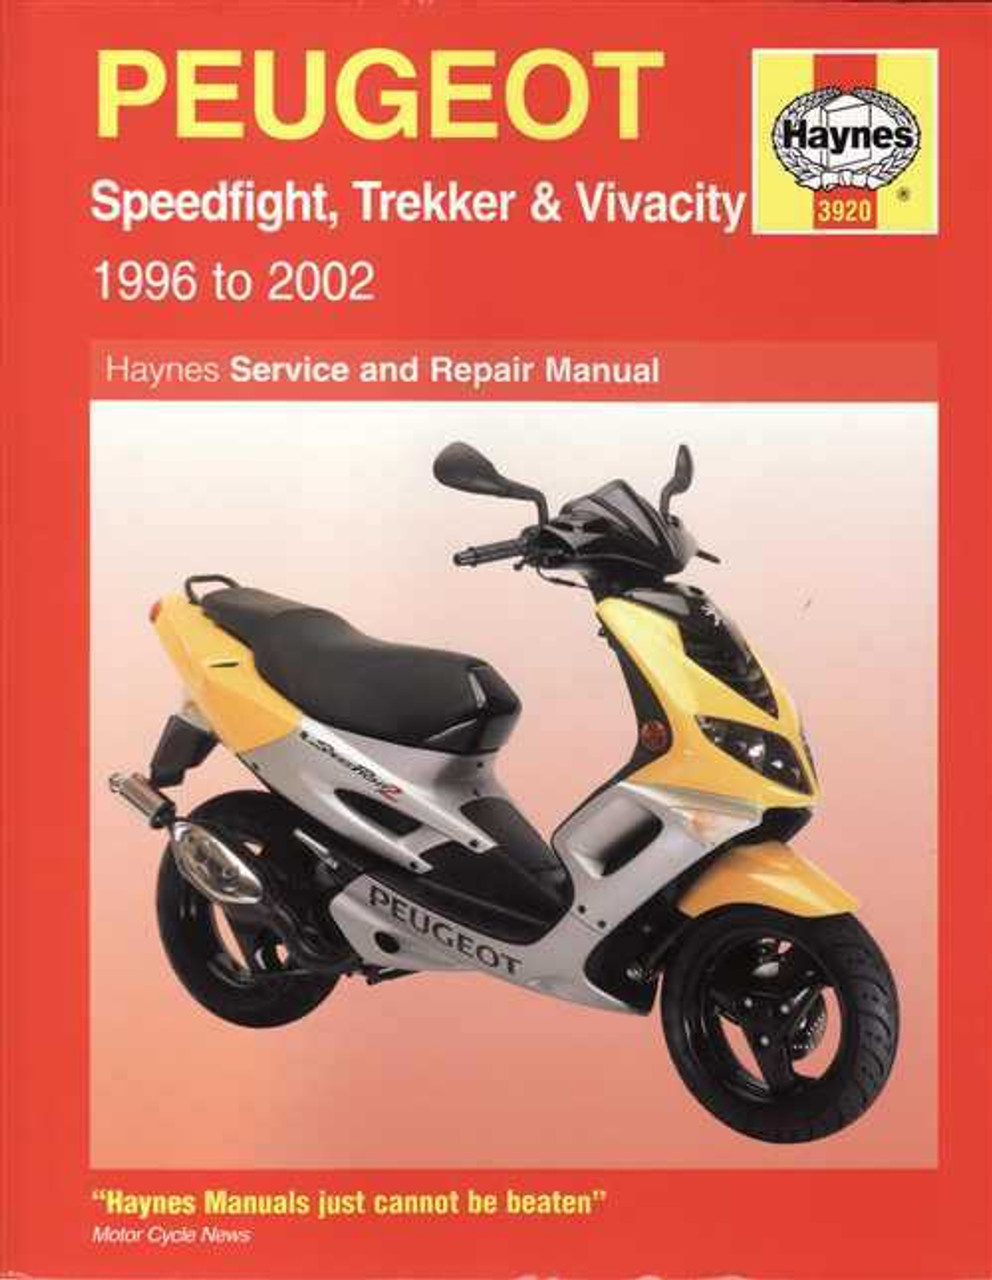 hight resolution of peugeot scooters speedfight trekker amp vivacity 1996 2002 workshop manual